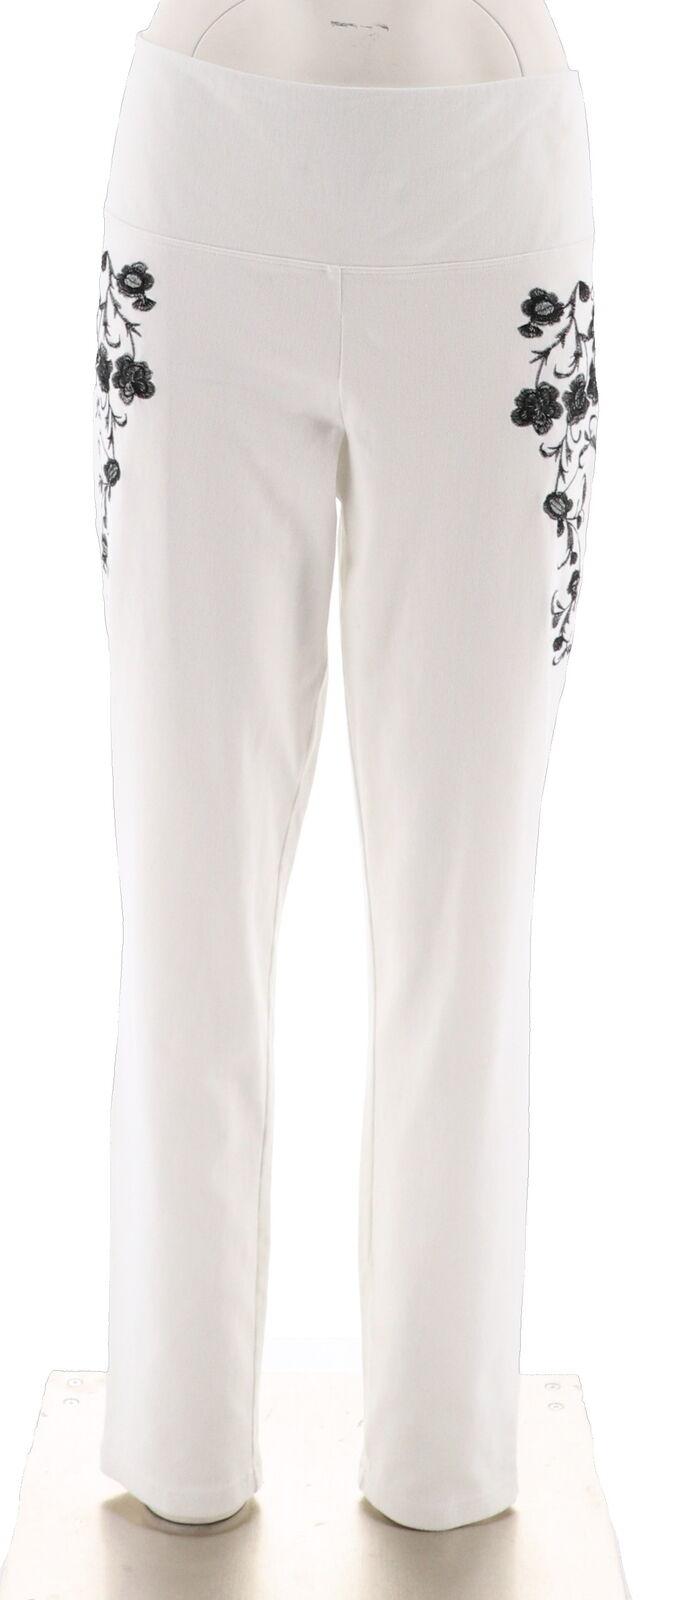 Women with Control Petite Prime Stretch Denim Novelty Jeans Color Black Size L